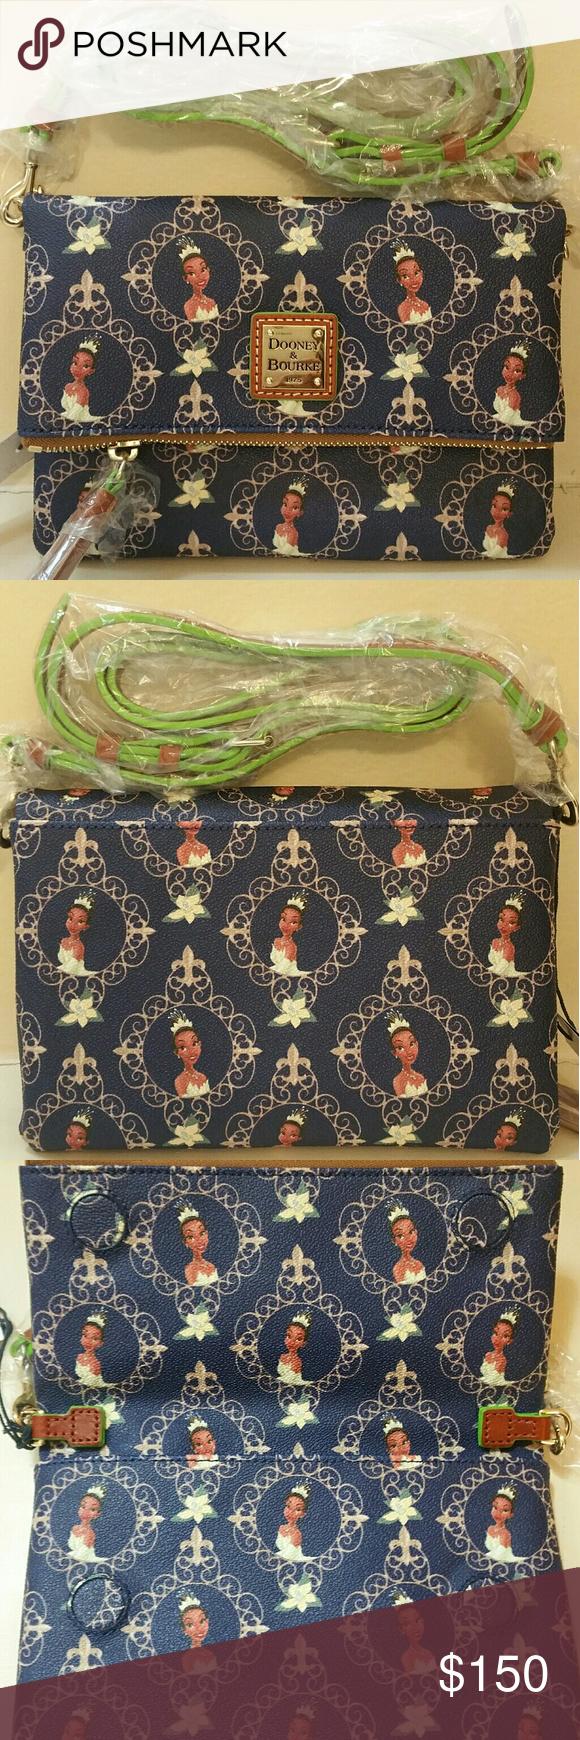 0aadfbc240f Disney Princess Tiana Fold Over Crossbody Bag. Just released on July ...